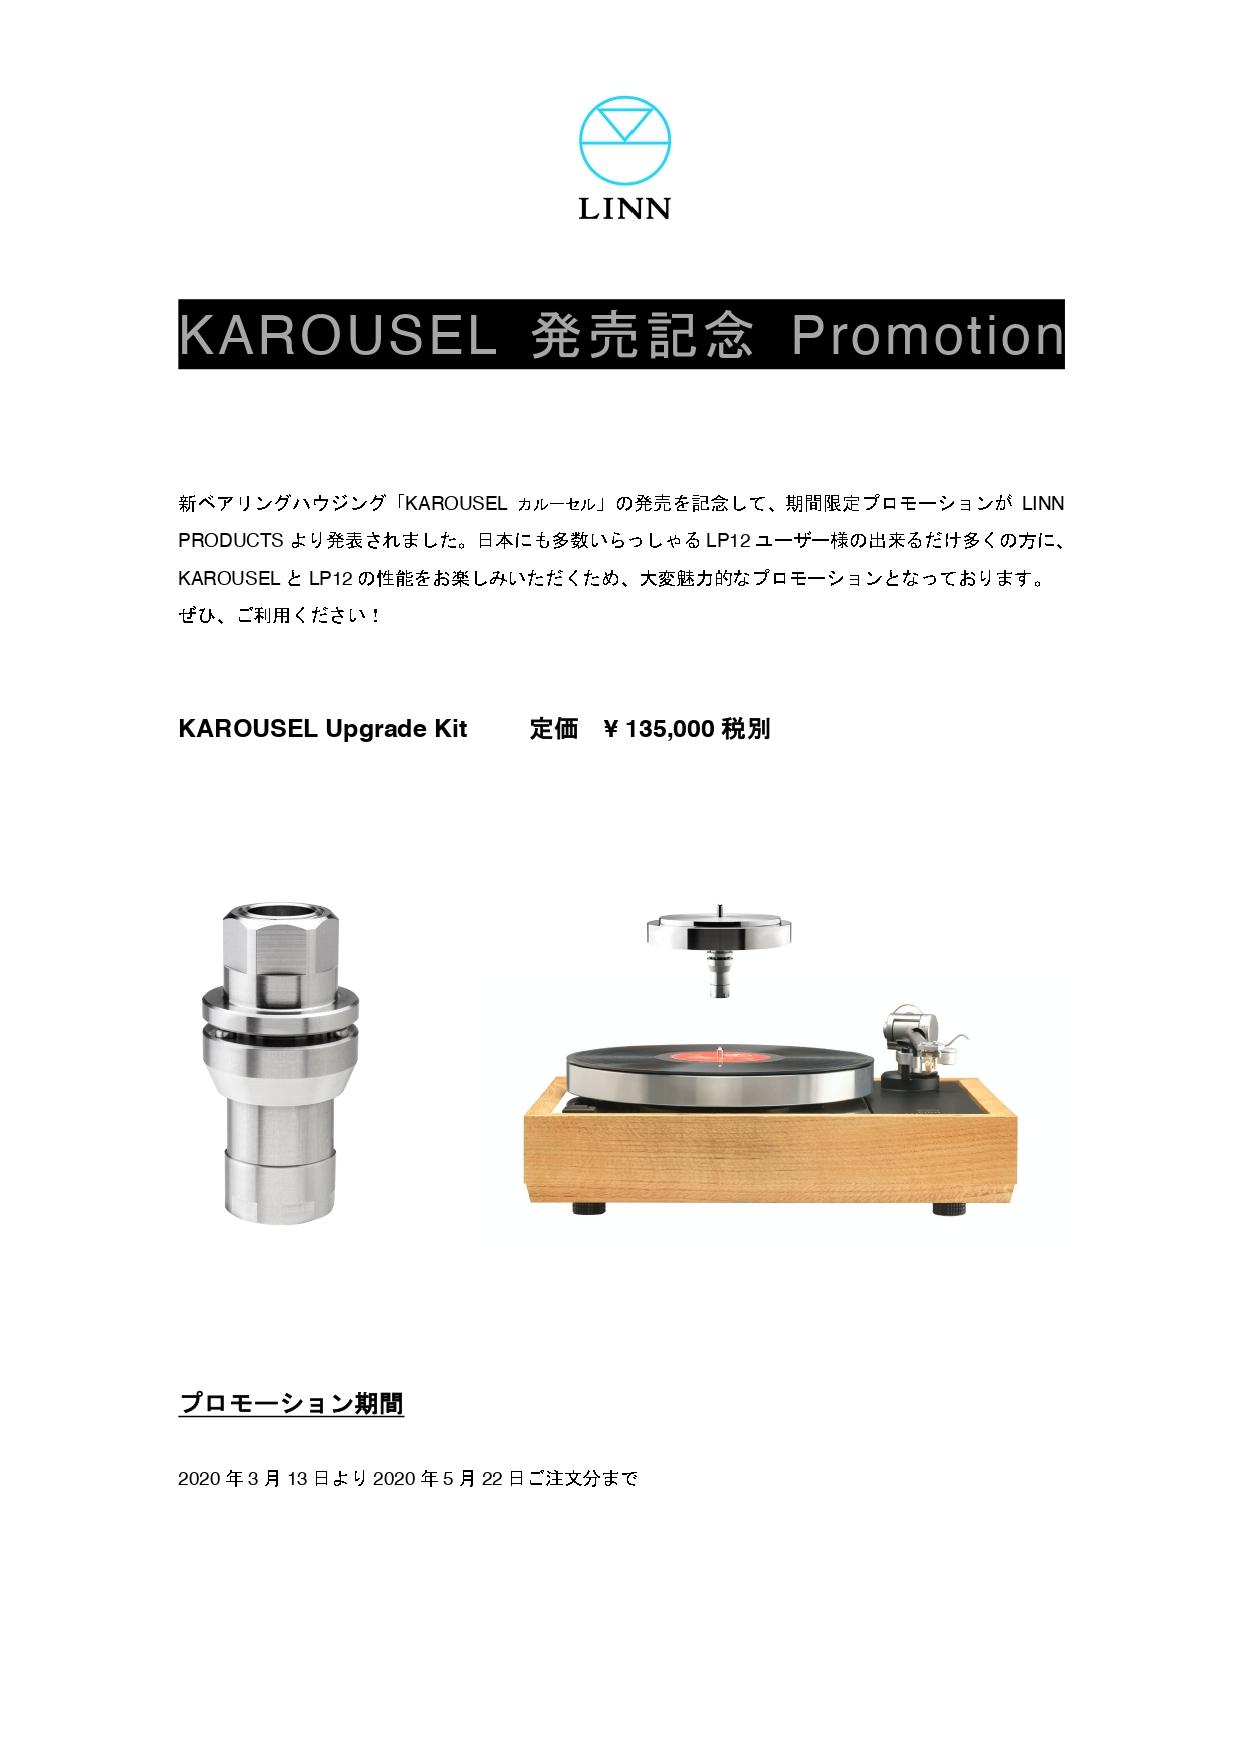 KAROUSEL発売記念プロモーション__page-0001